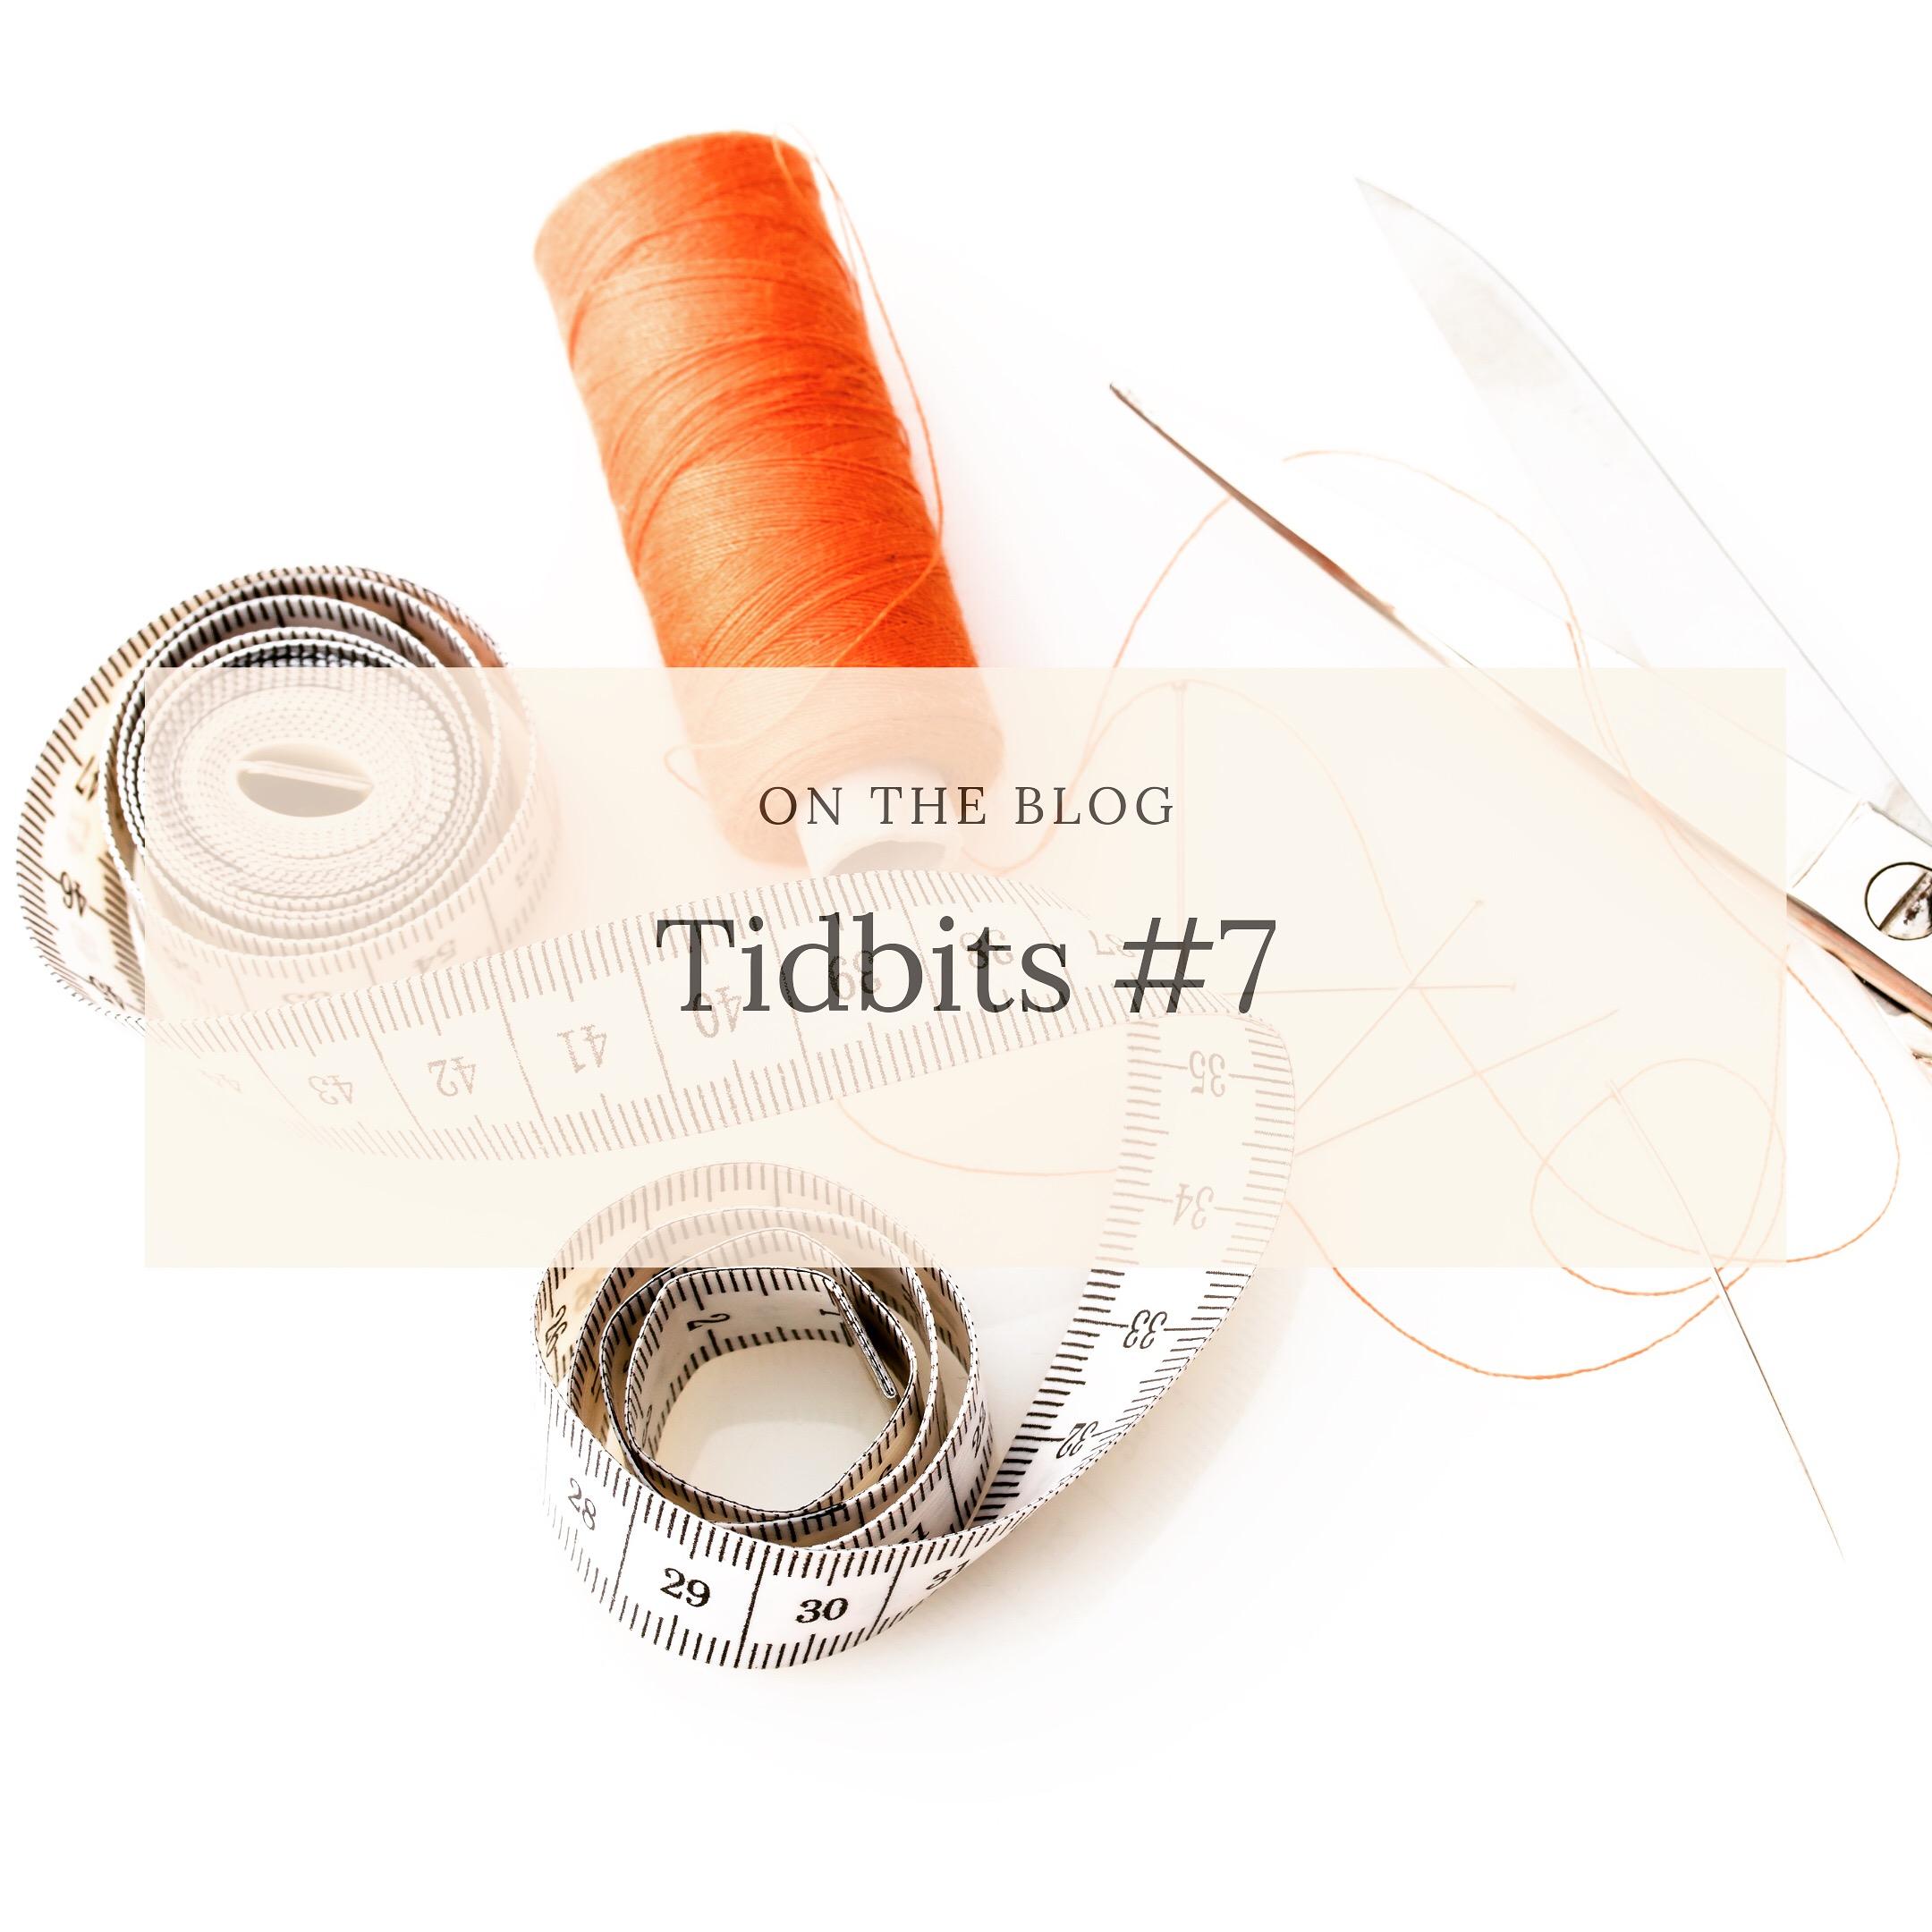 Sewing Tidbits Cover image 7